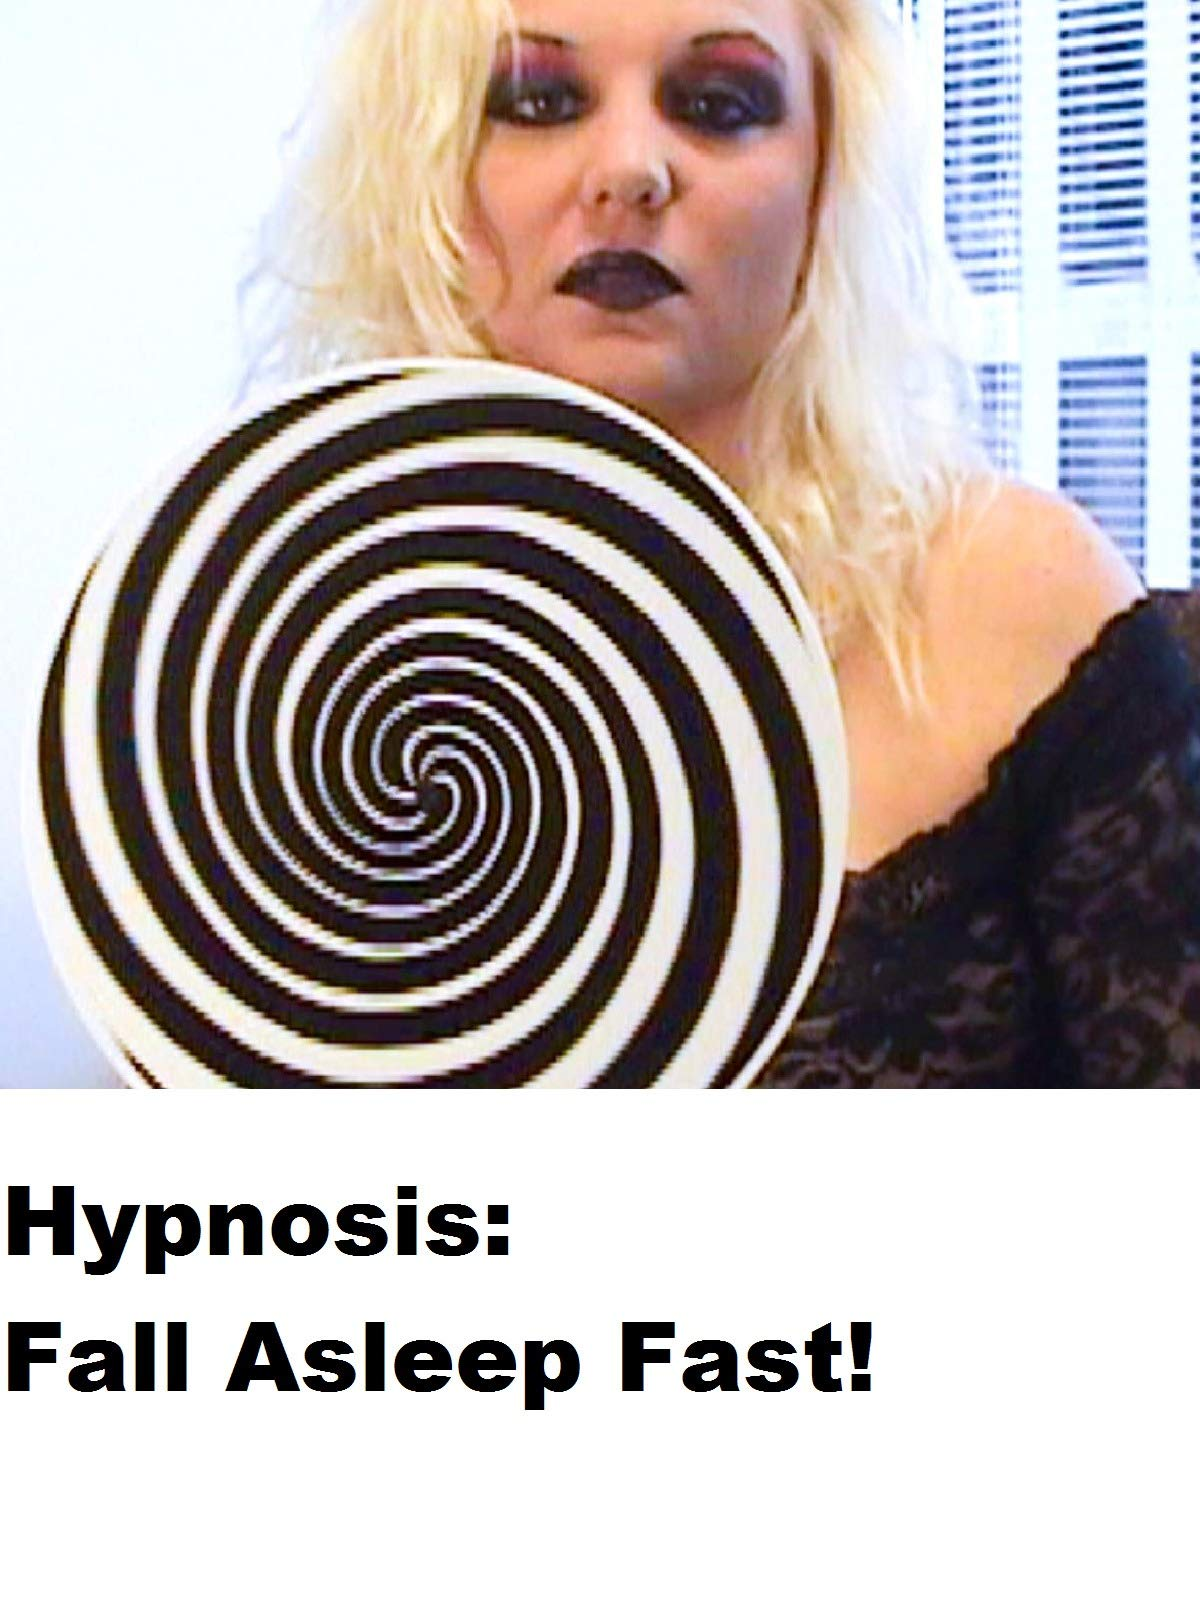 Clip: Hypnosis: Fall Asleep Fast!